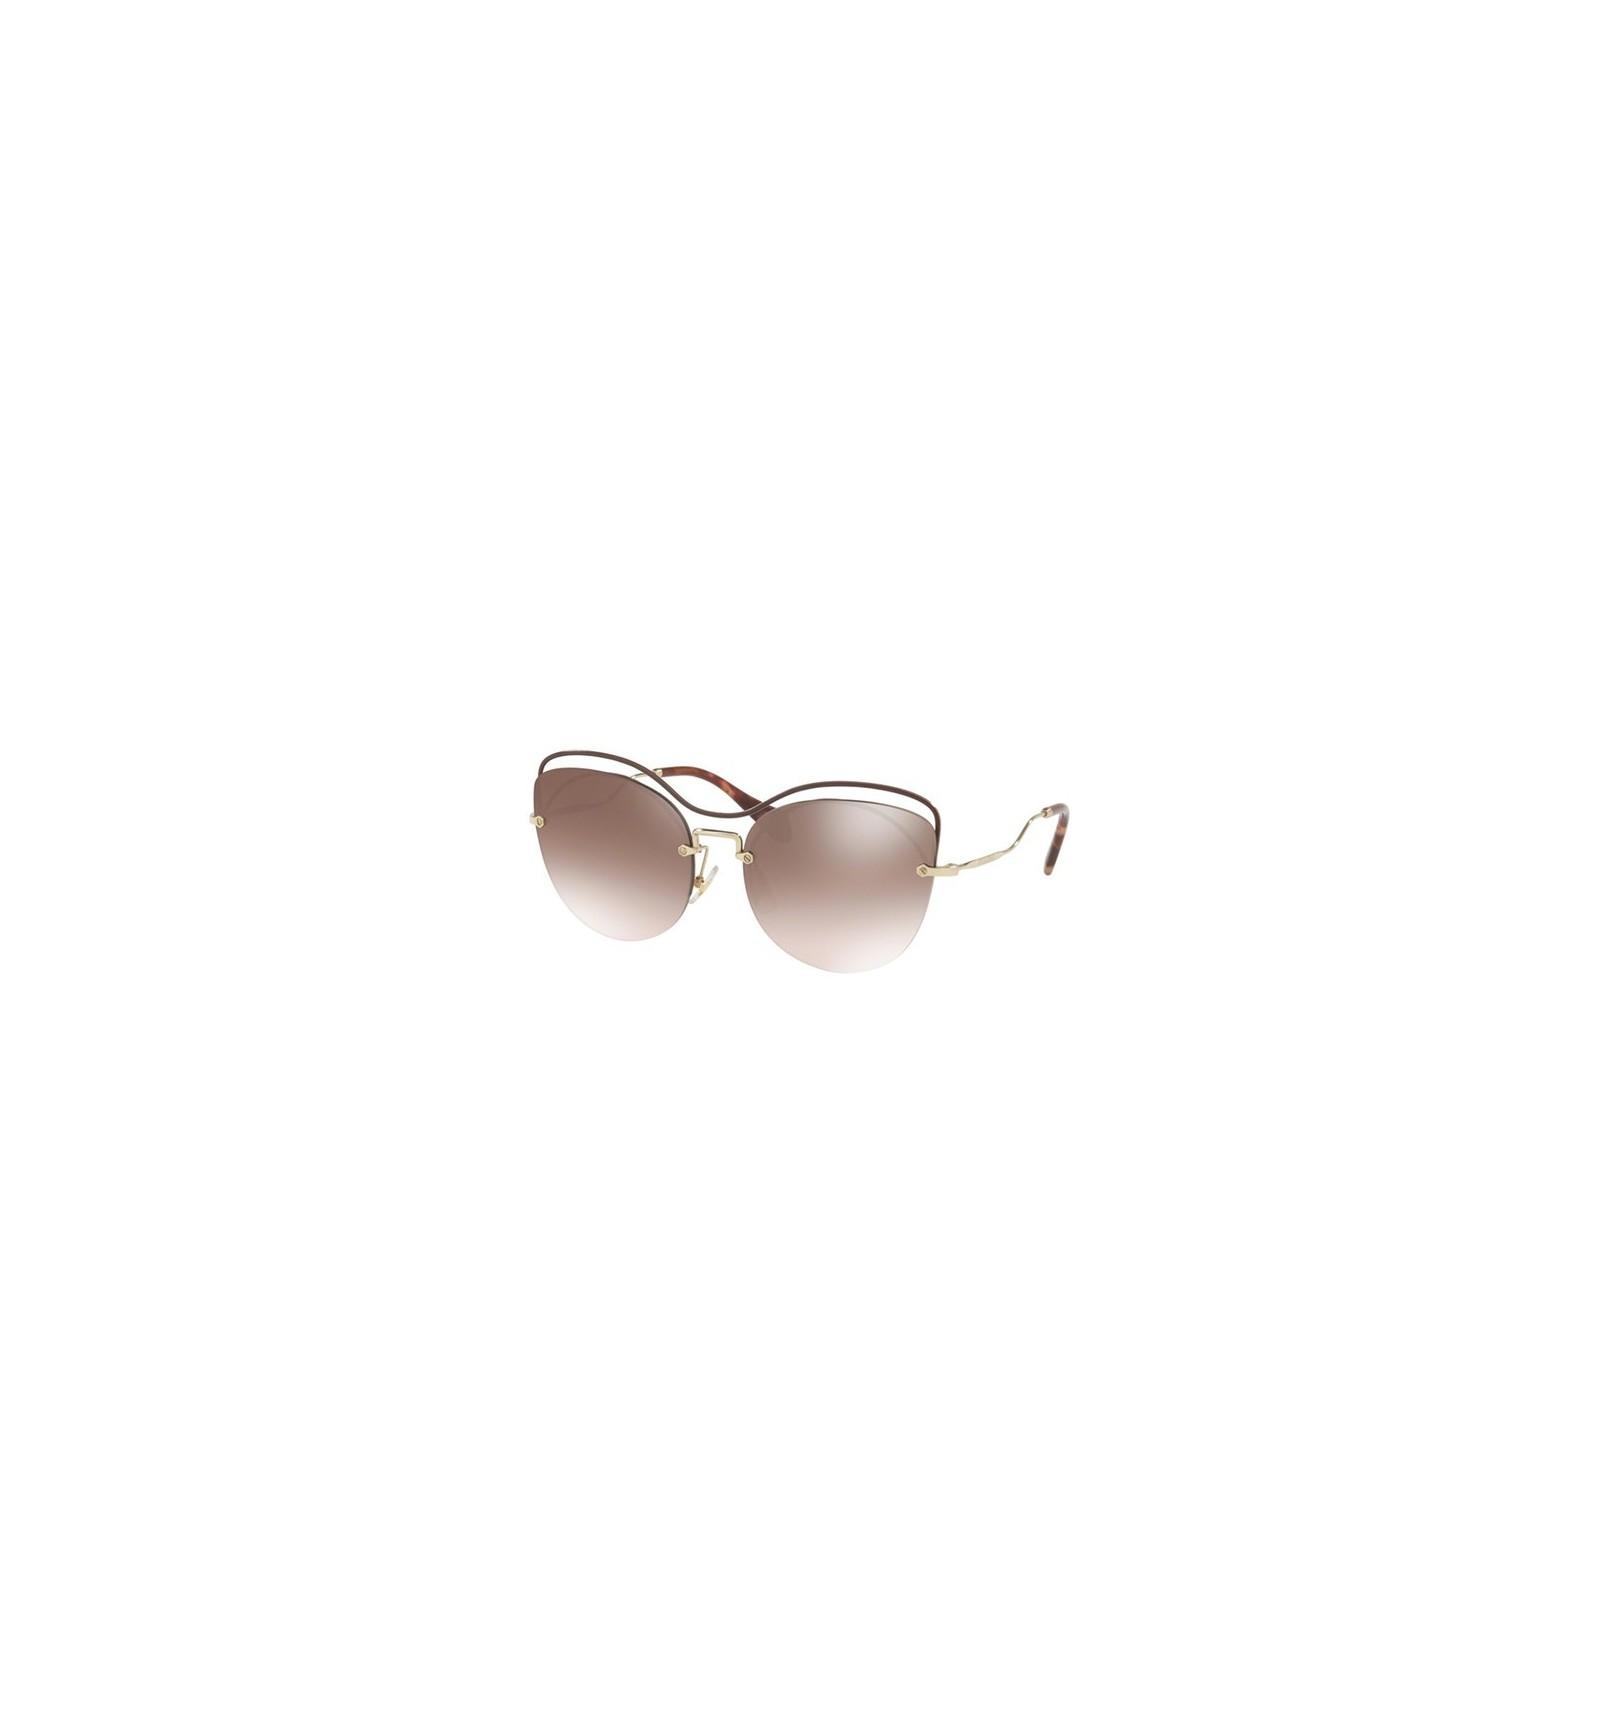 e693866e0b Gafas de sol MIU MIU SMU50TS SCENIQUE EVOLUTION Brown - Brown Silver  (R1J-QZ9